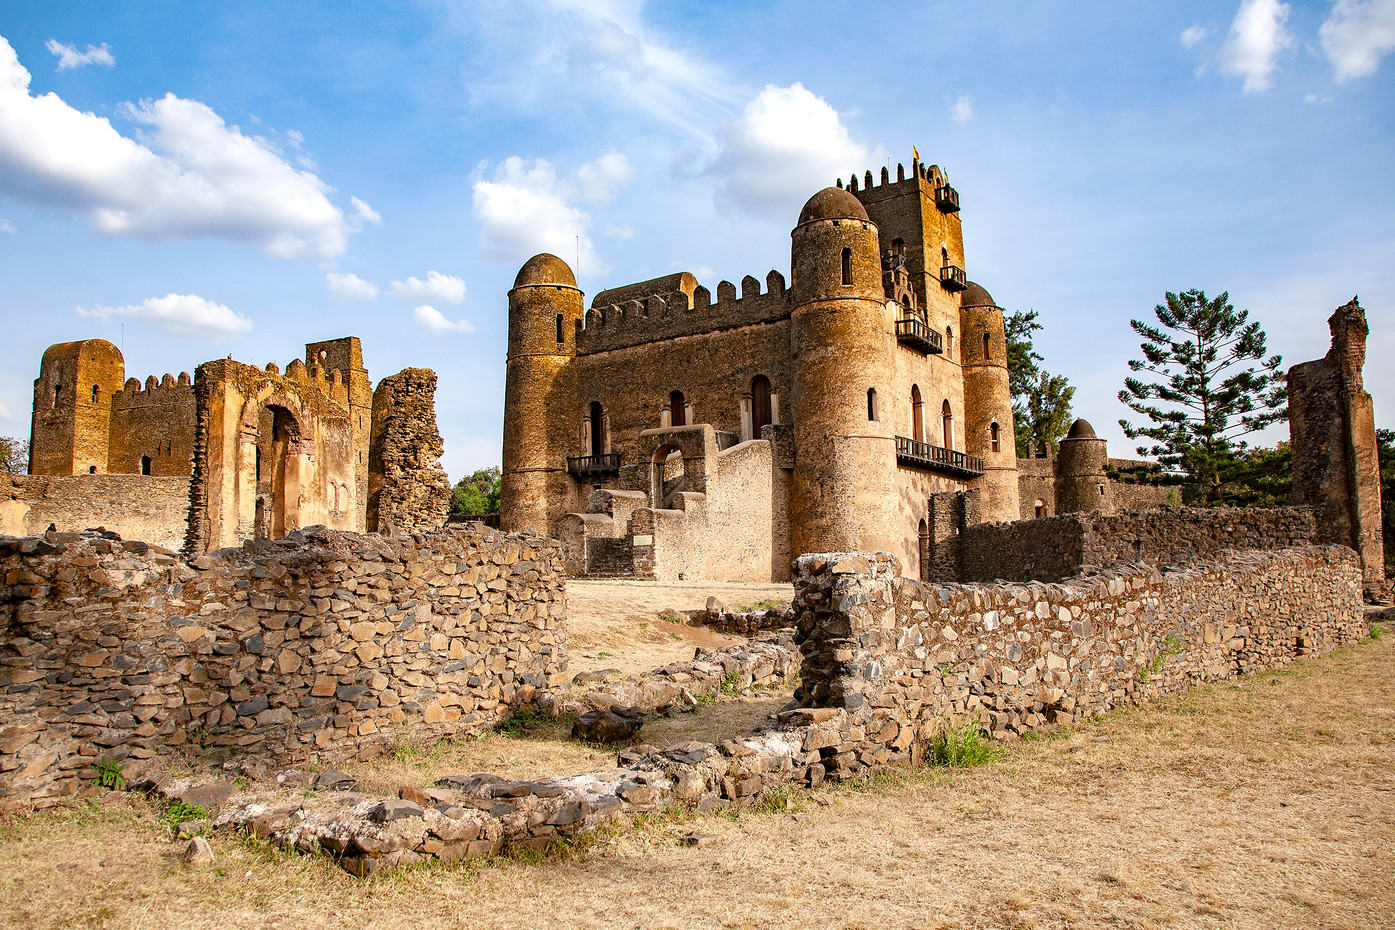 Medievil castles in Gondar, Ethiopia